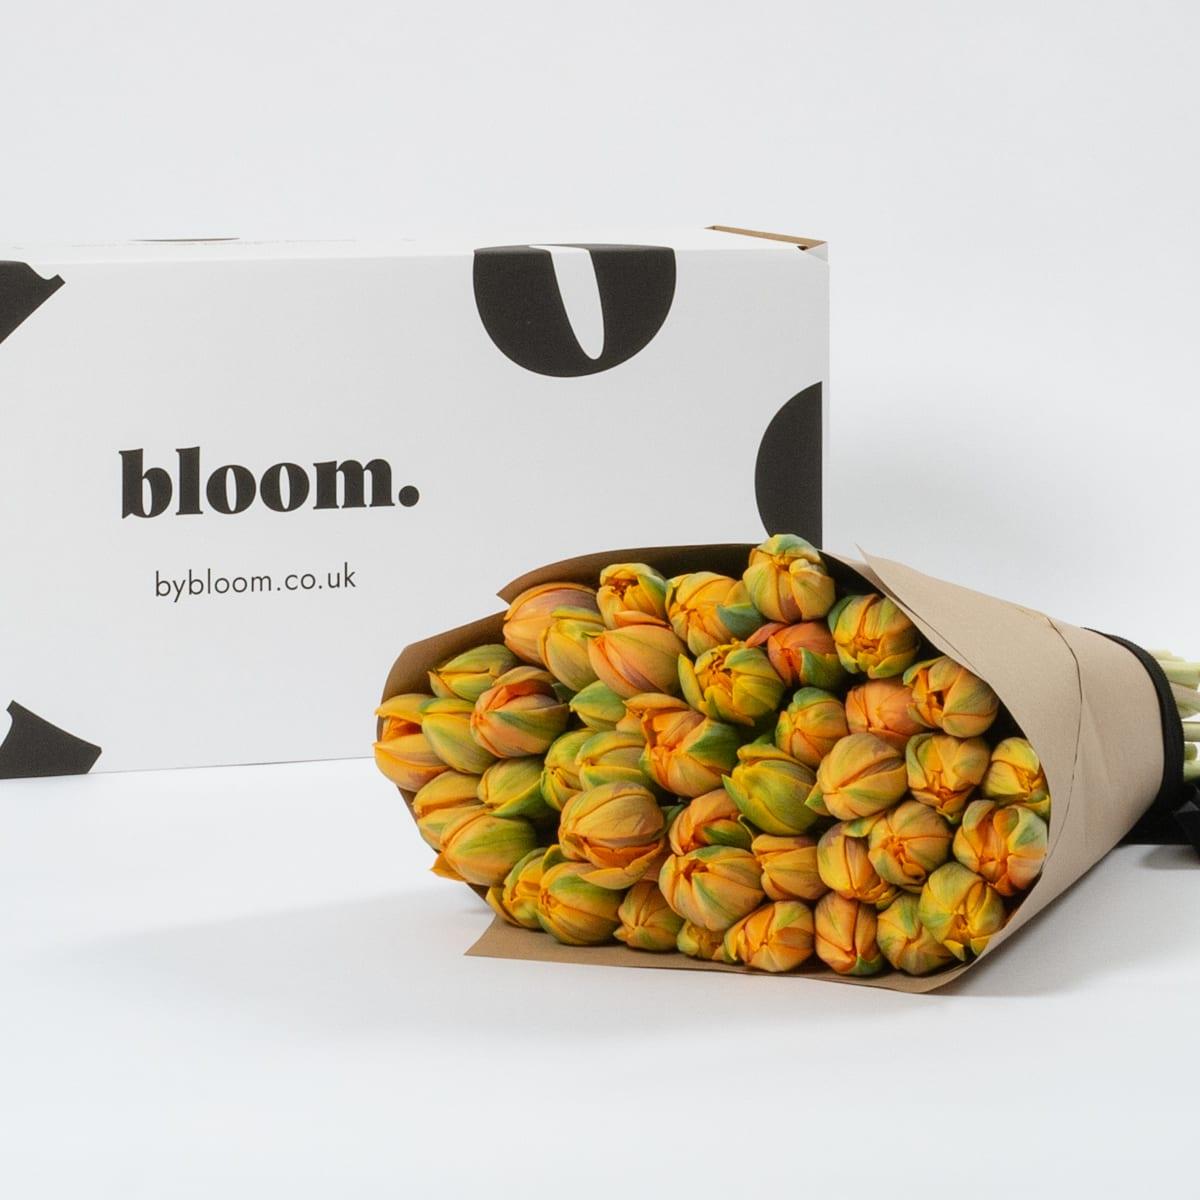 Bloom Flower Delivery | Tangerine Tulips